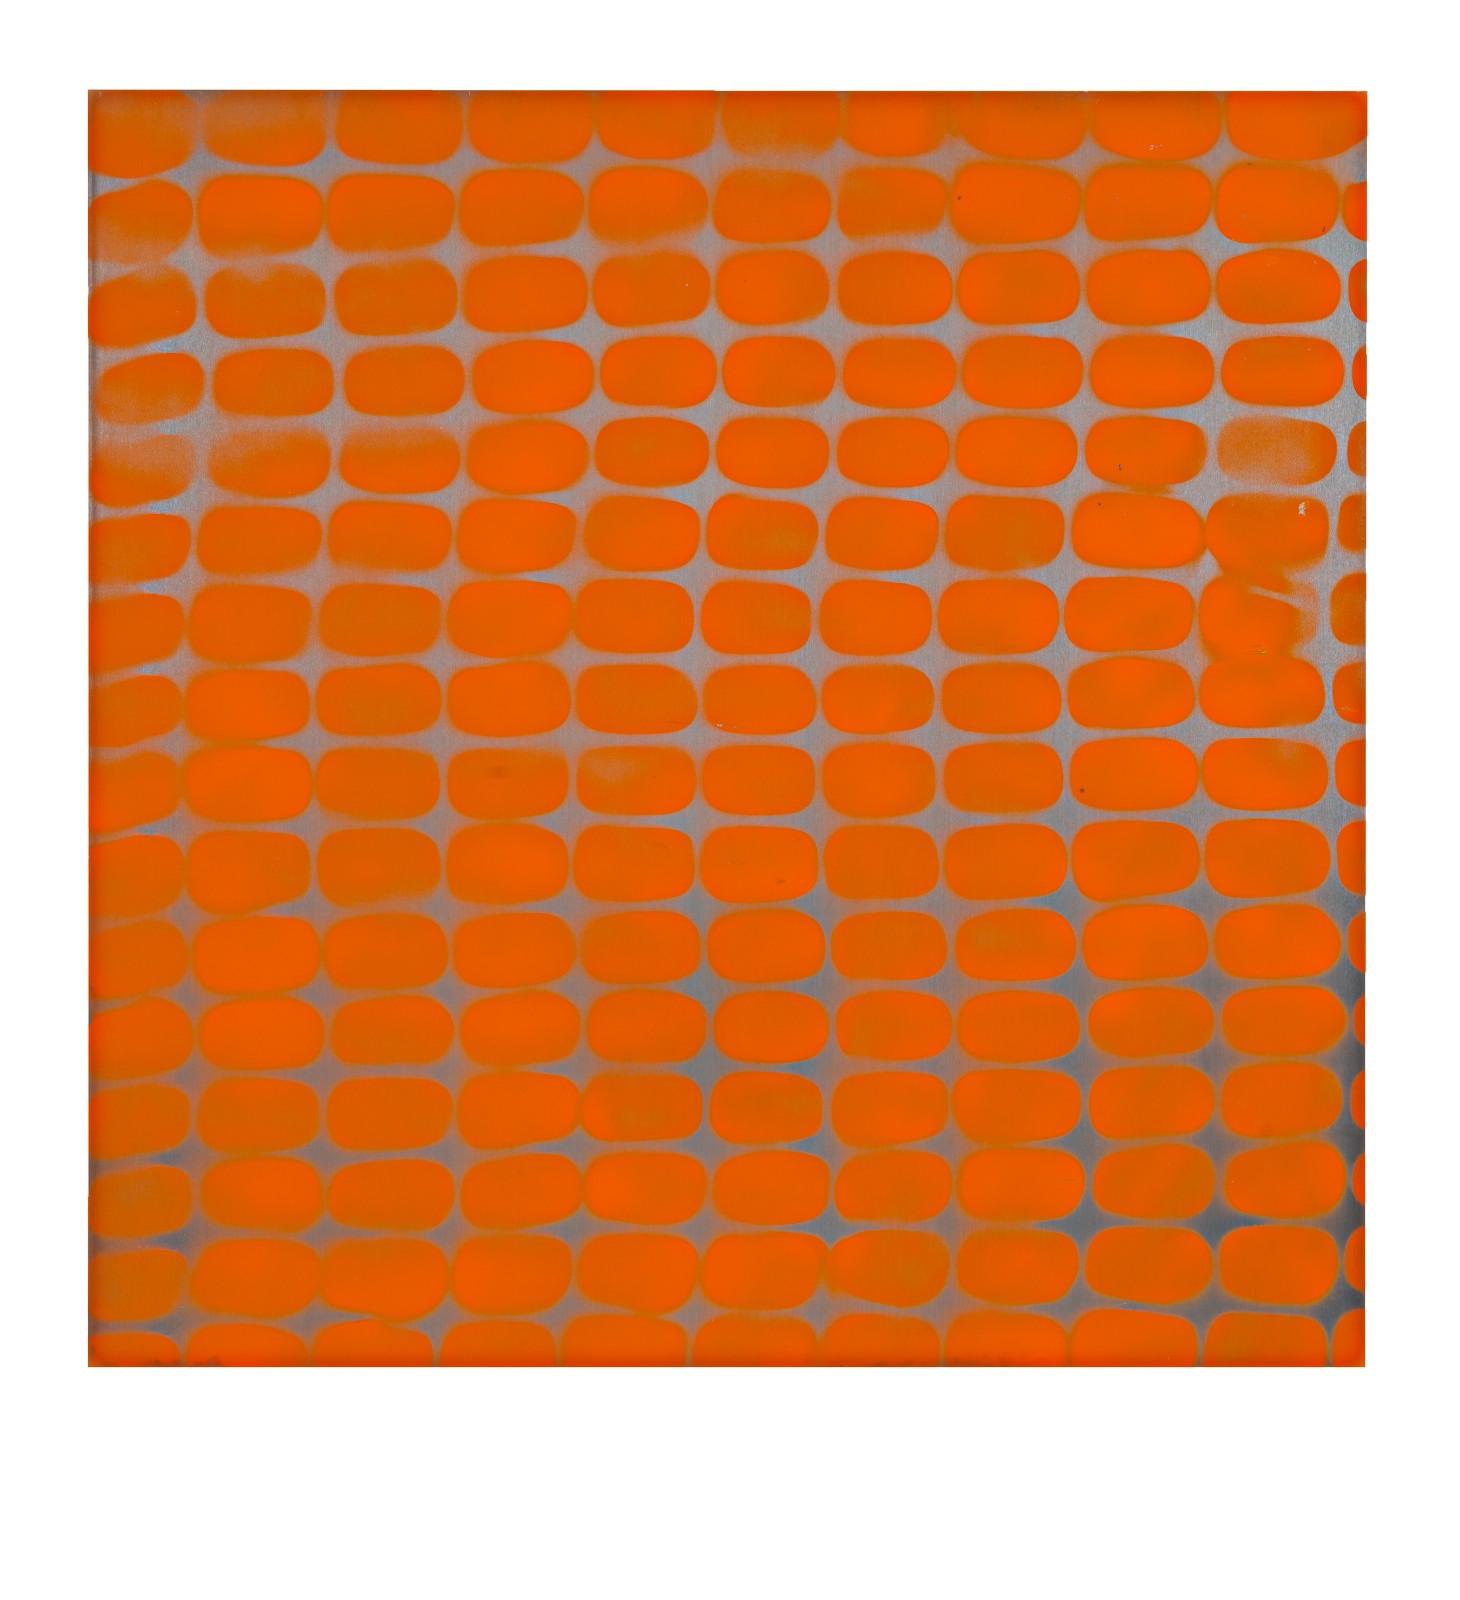 "STAIN : 40°42'53.6""N 73°56'35.4""W, 2015, spraypaint on aluminium, 81,3 x 81,3 cm"